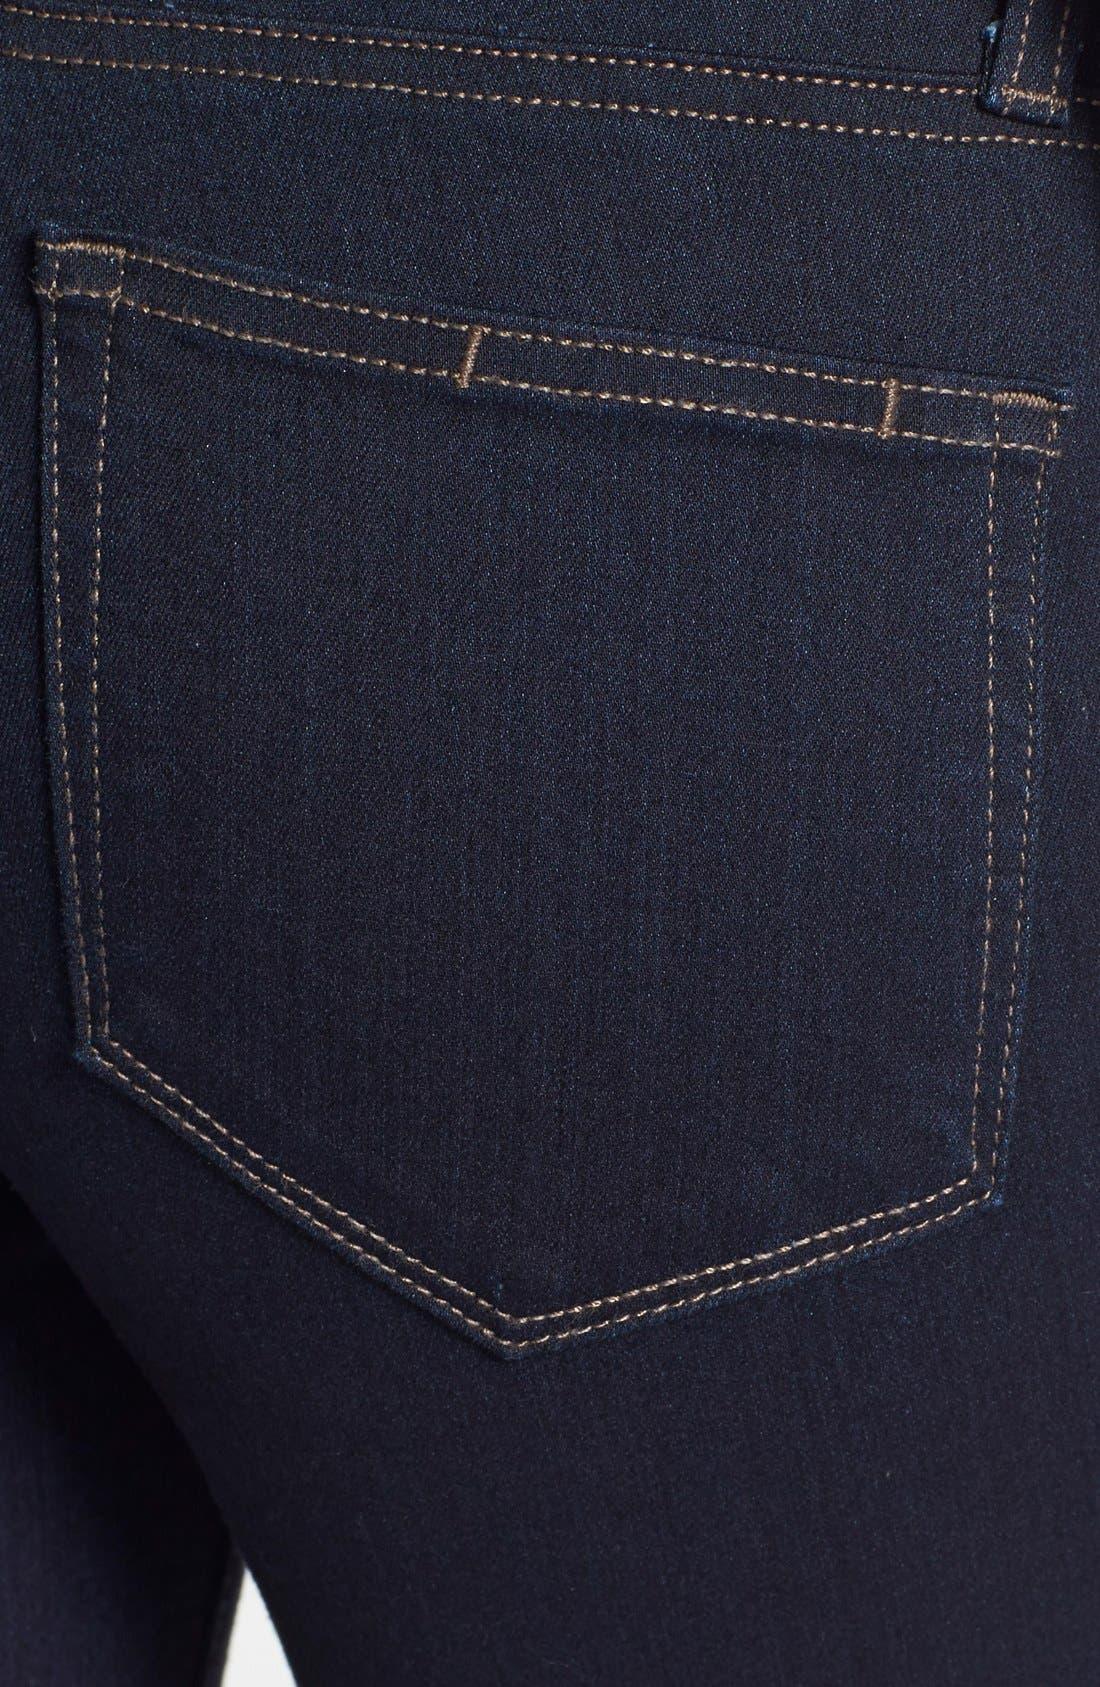 Alternate Image 3  - Paige Denim 'Transcend - Hoxton' High Rise Ankle Jeans (Rockwell)